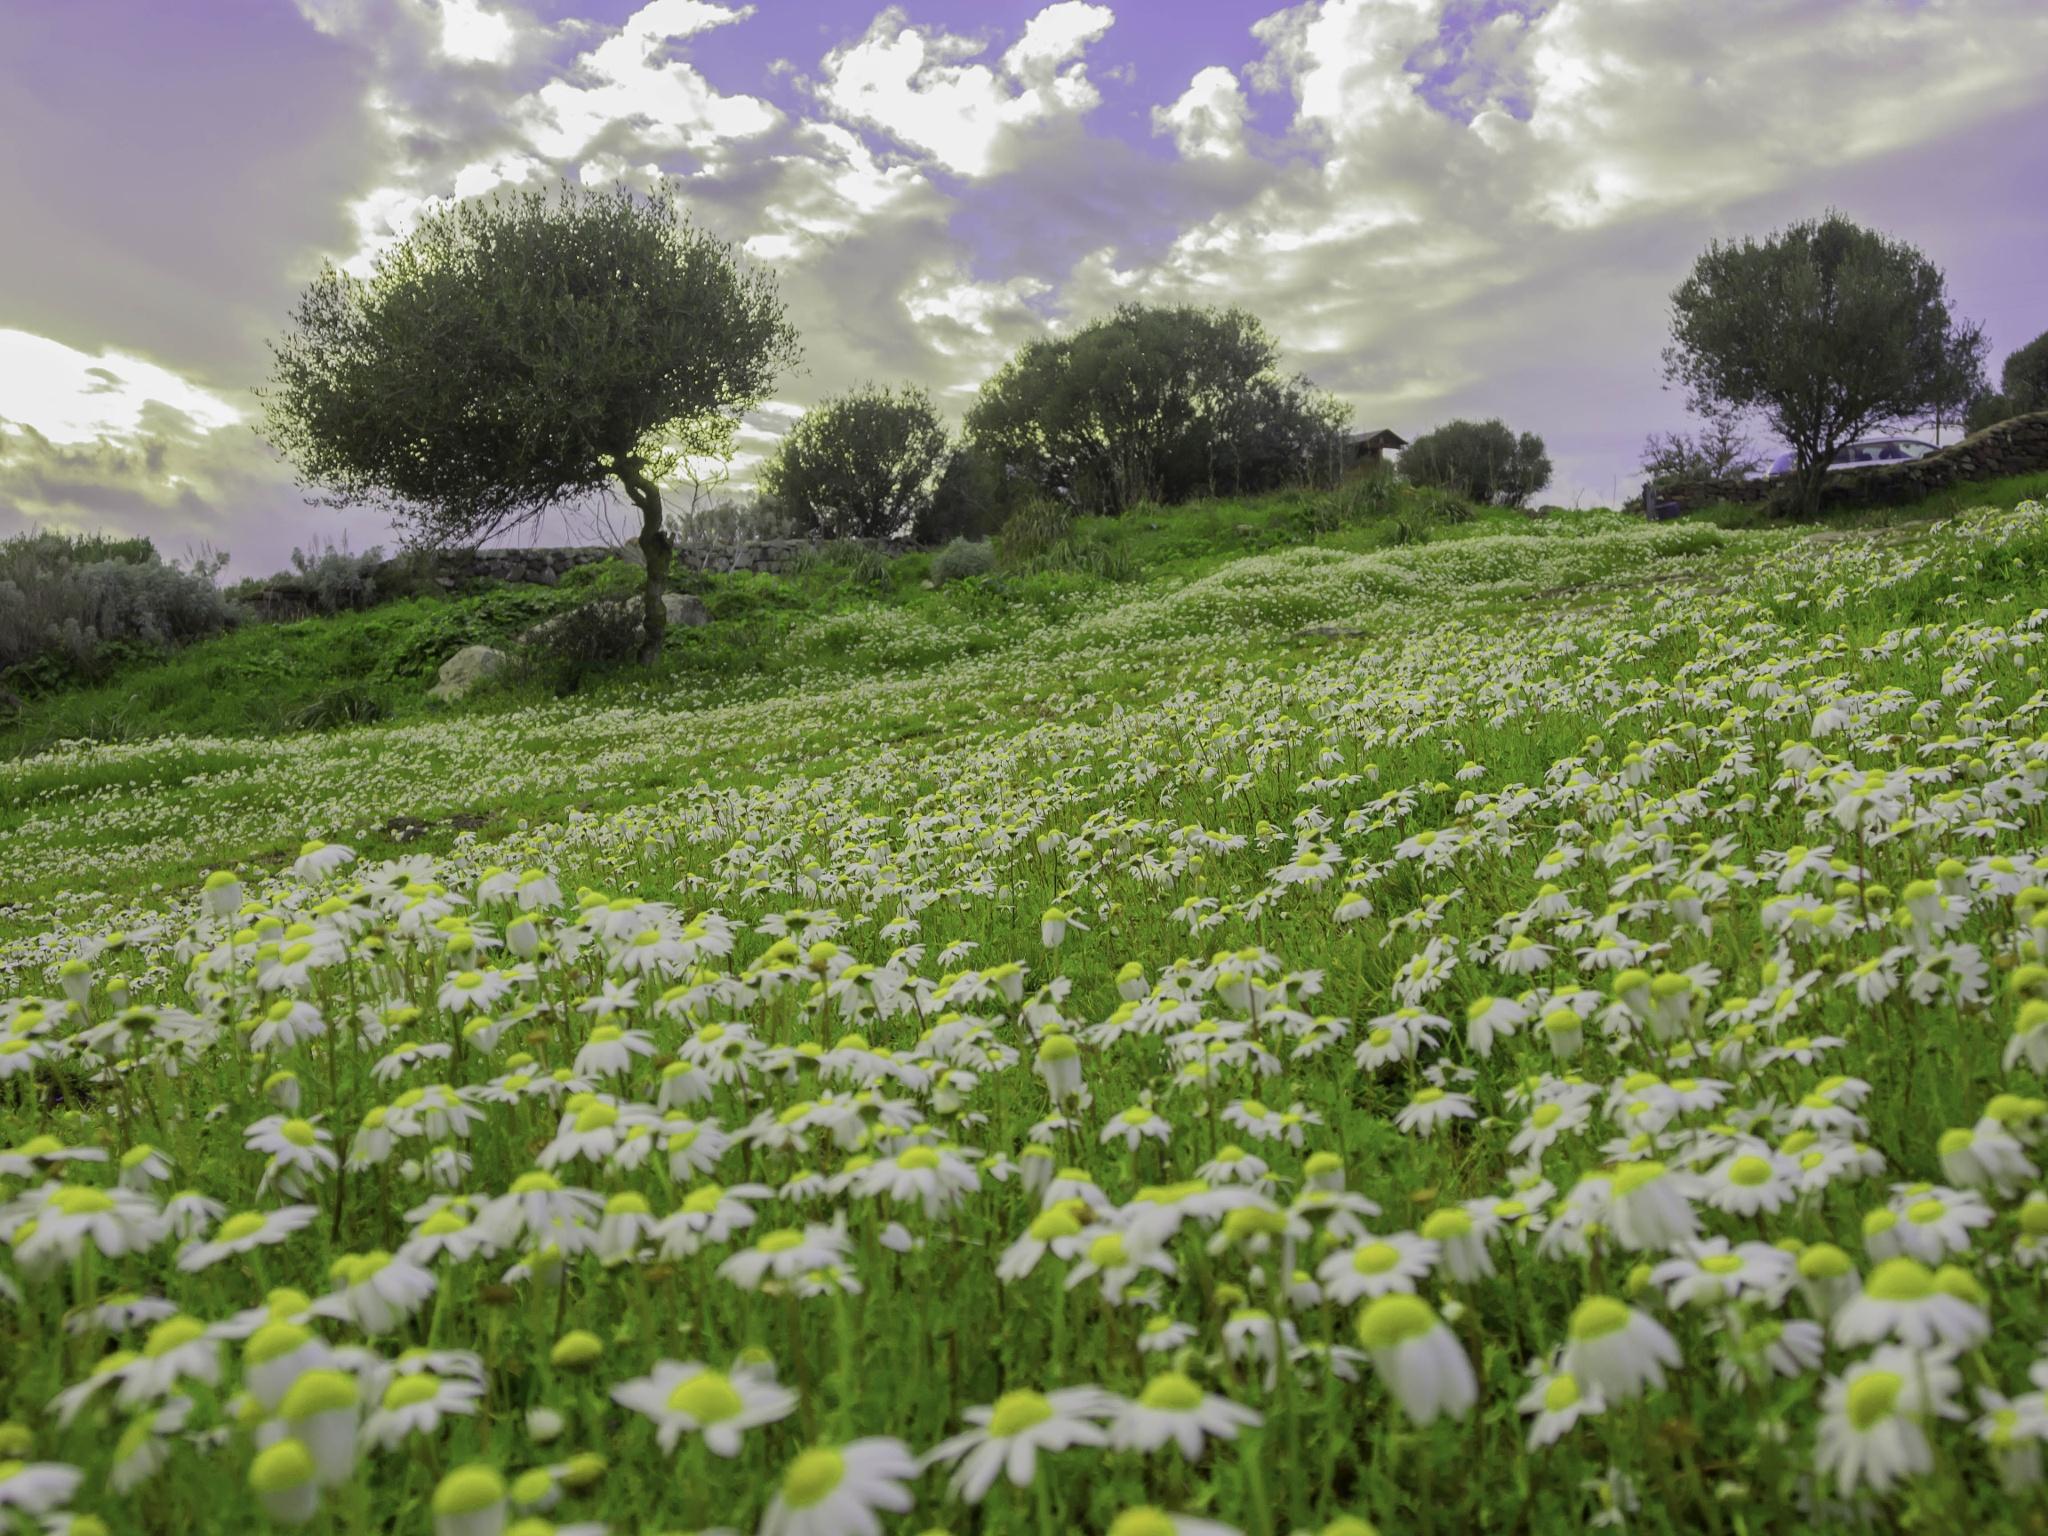 Primavera by Michele Pinna Marras